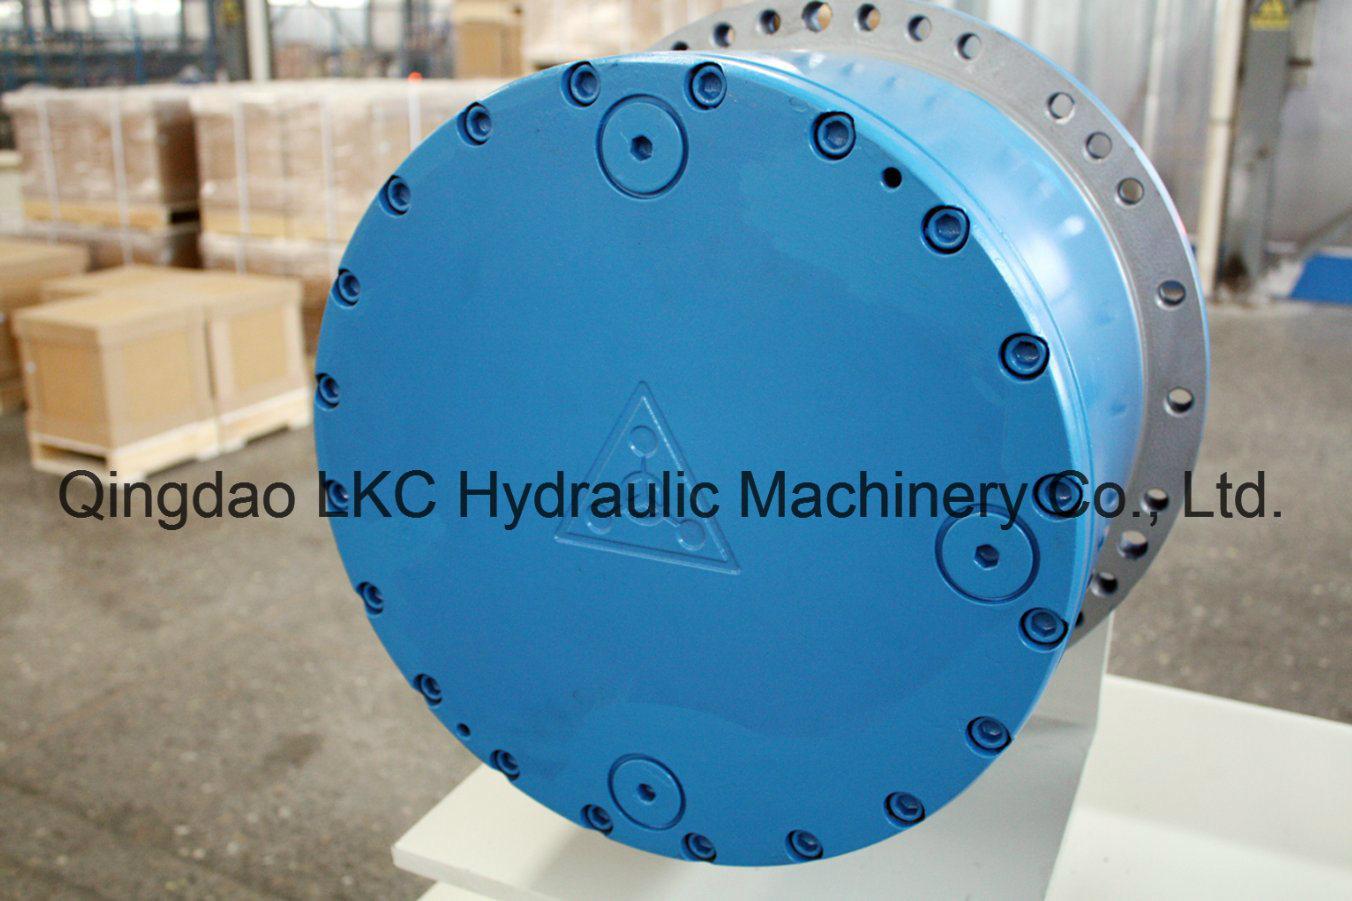 Excavator Spare Parts for Daewoo, Doosan, Hyundai 7t~9t Crawler Machinery